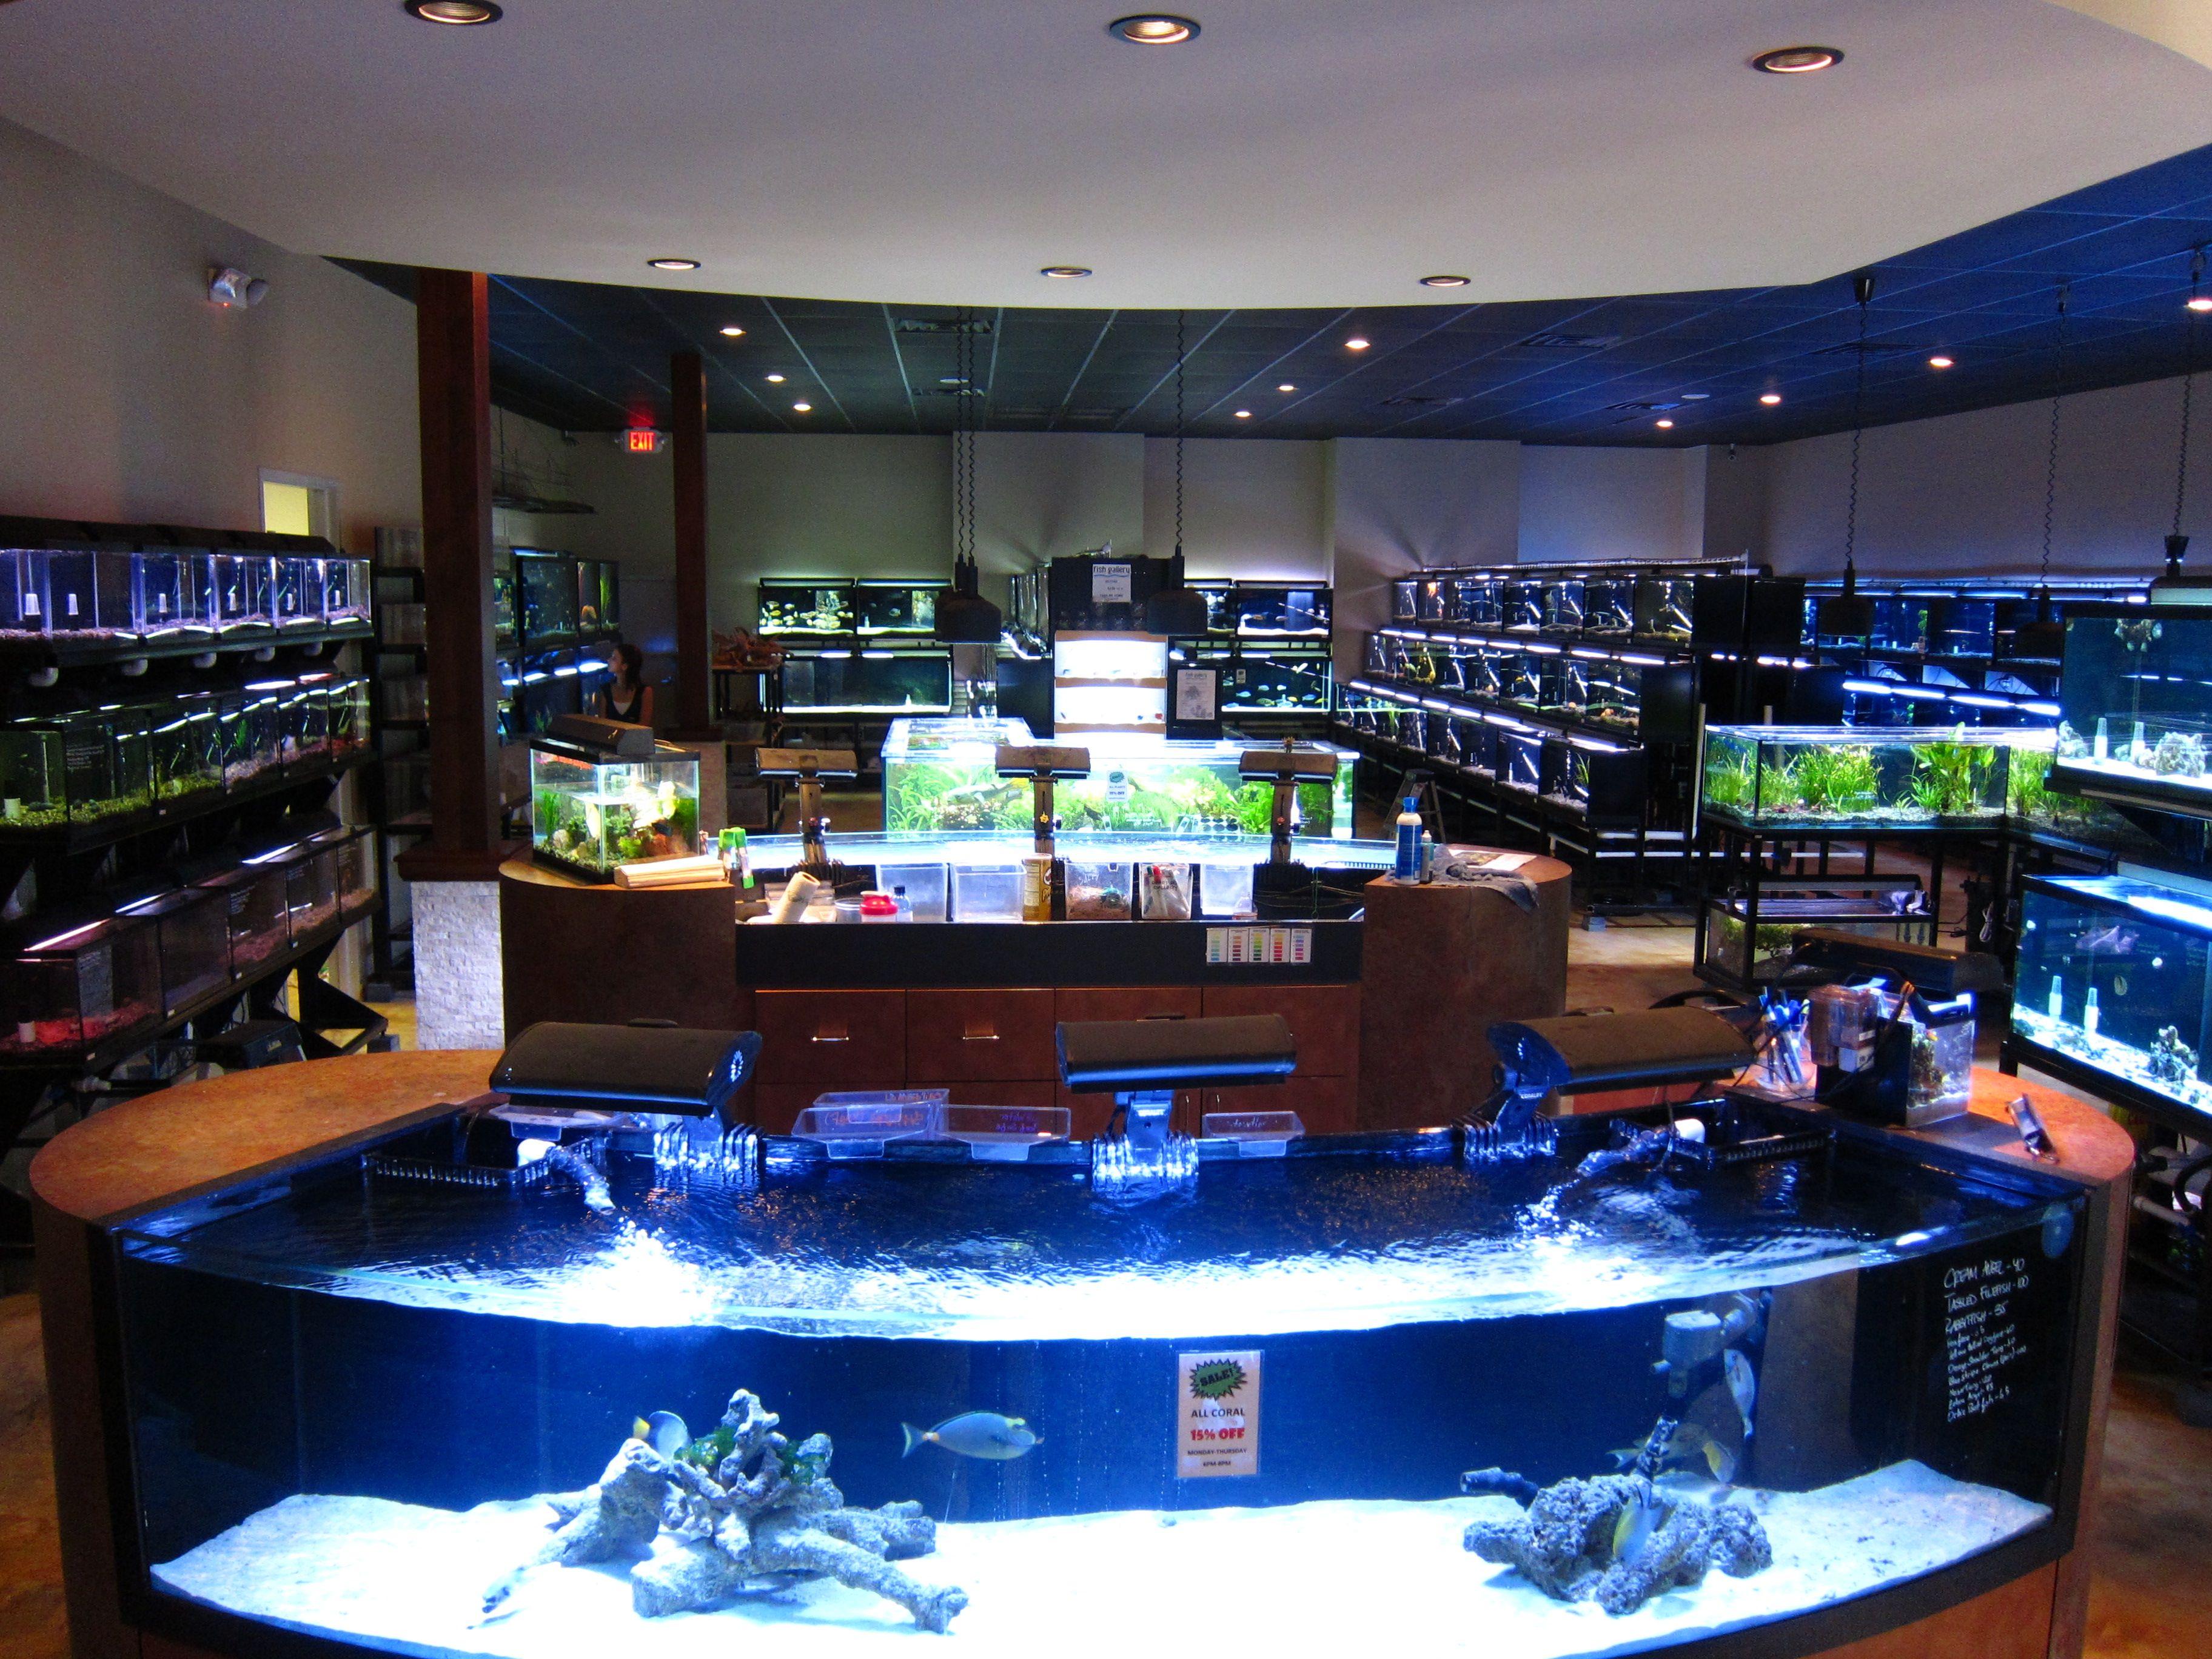 Plan your visit to the houston aquarium fish room maybe for Aquarium shop